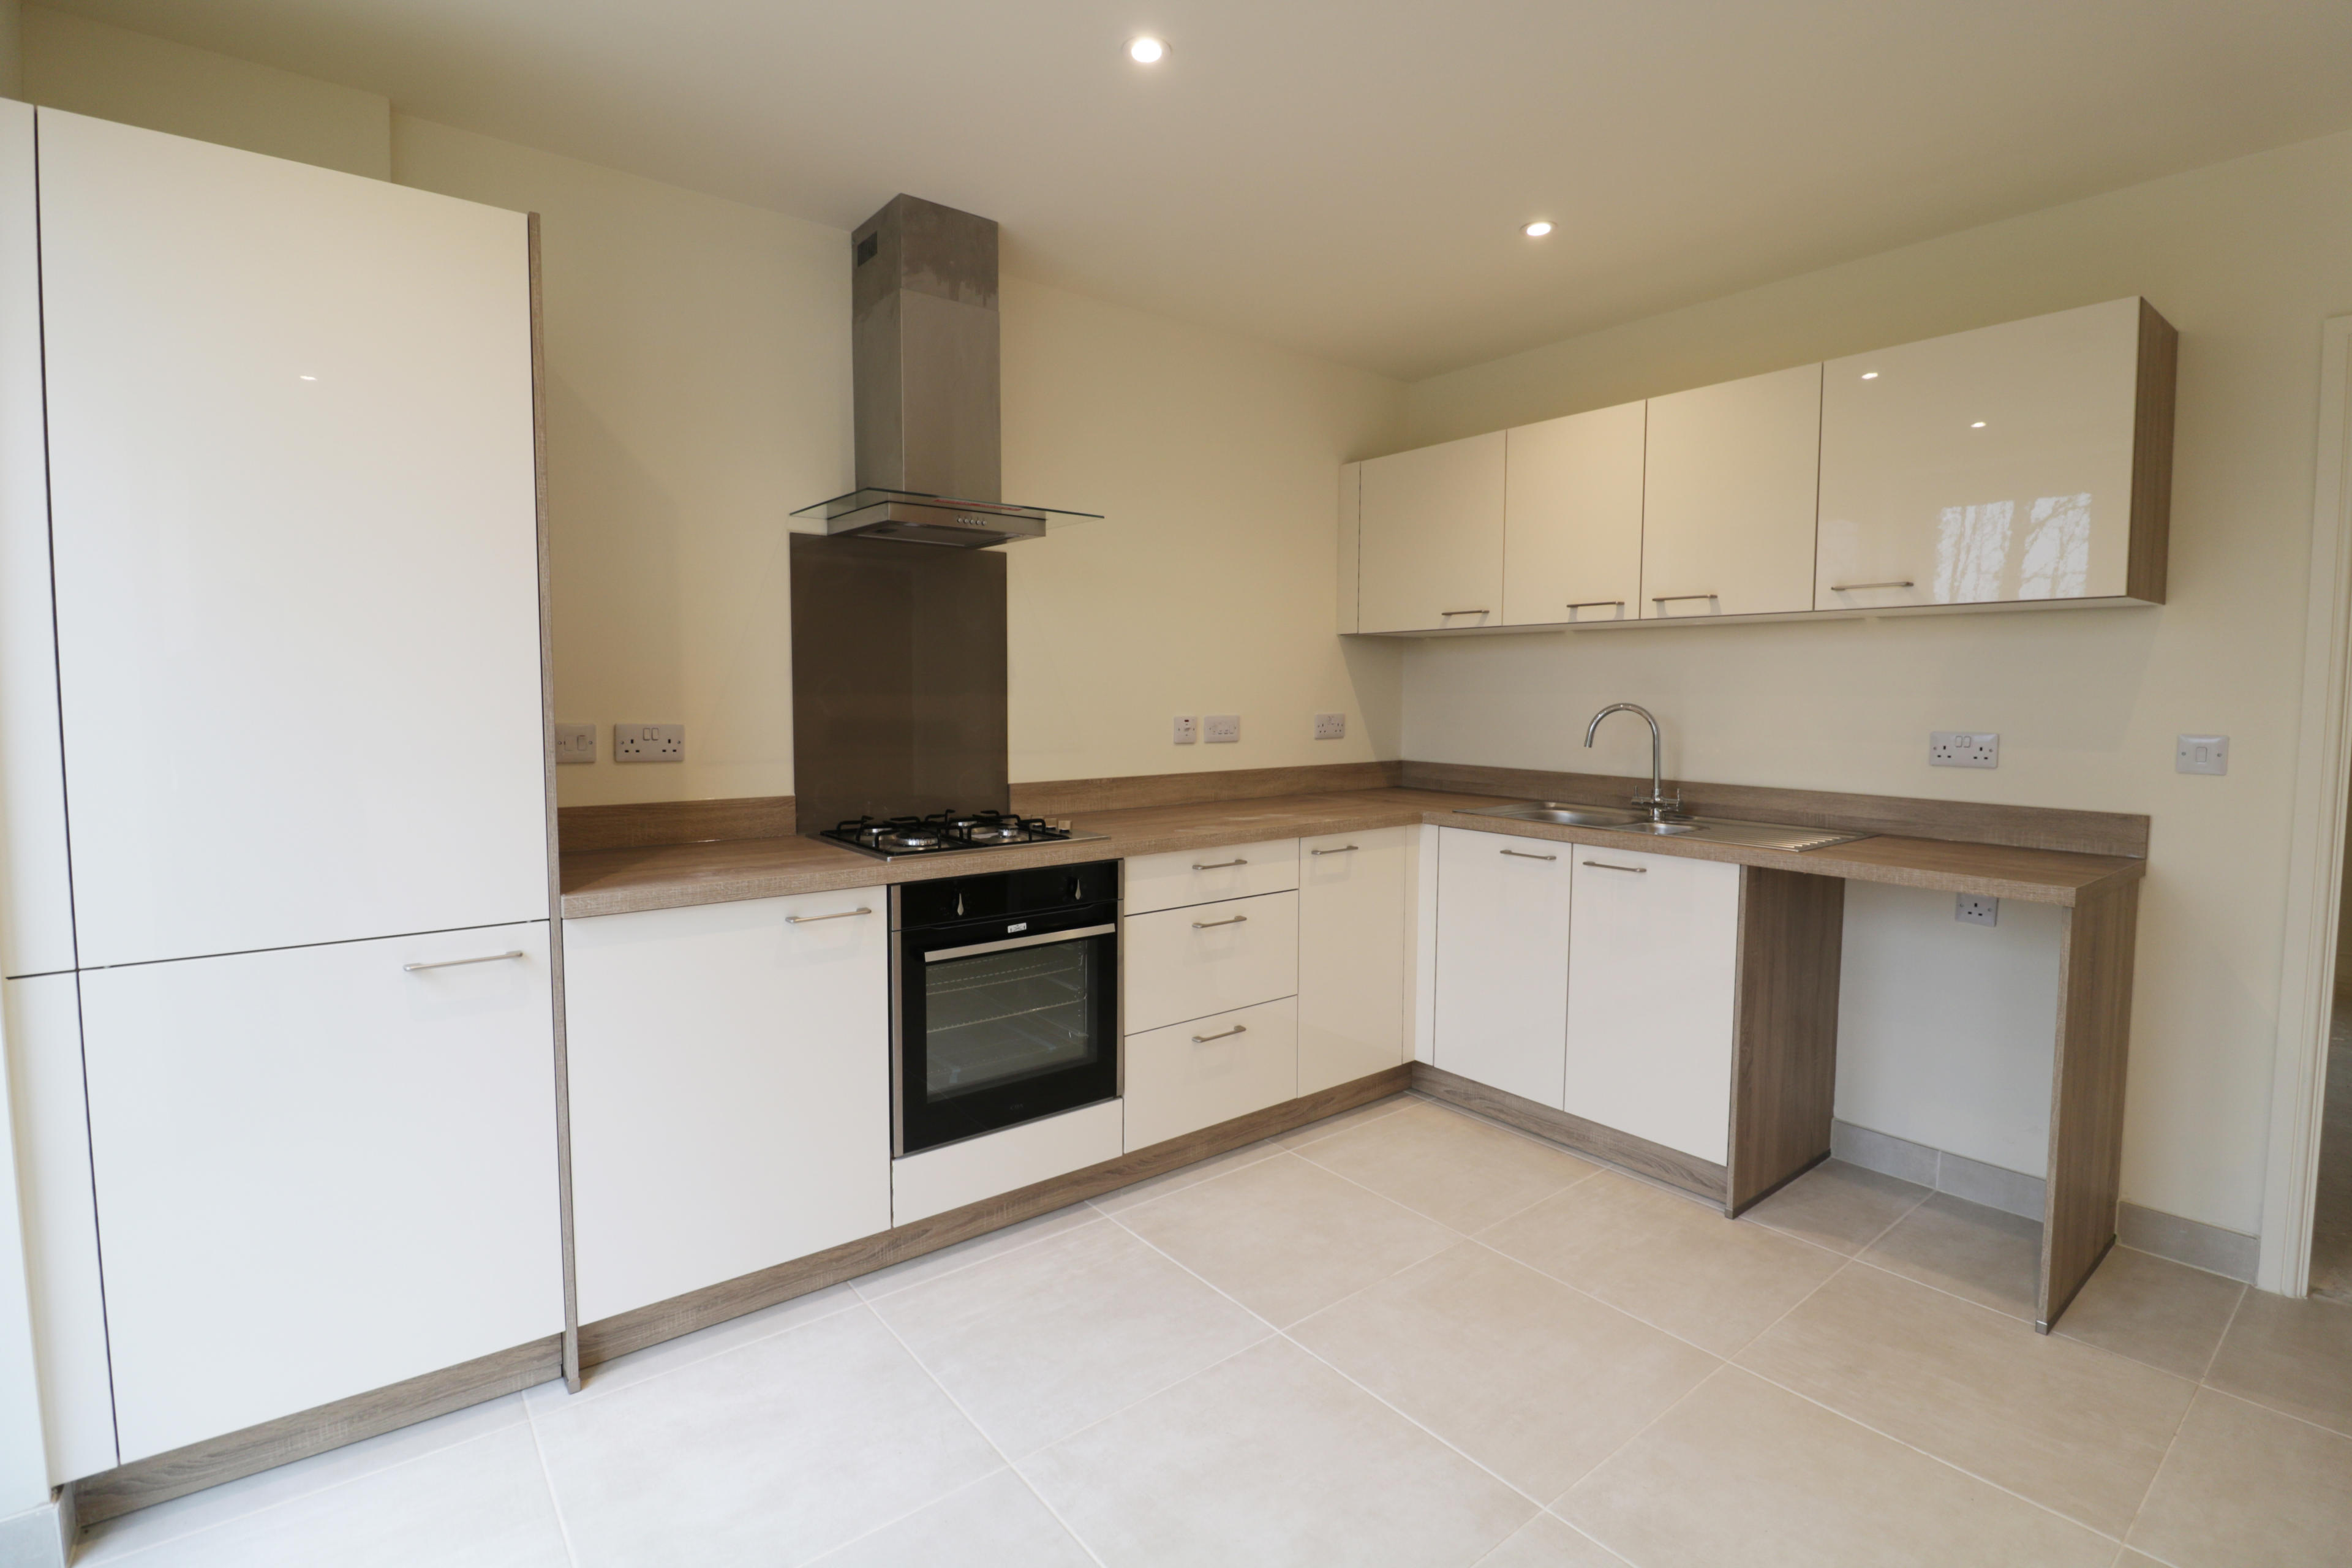 Procter kitchen 2